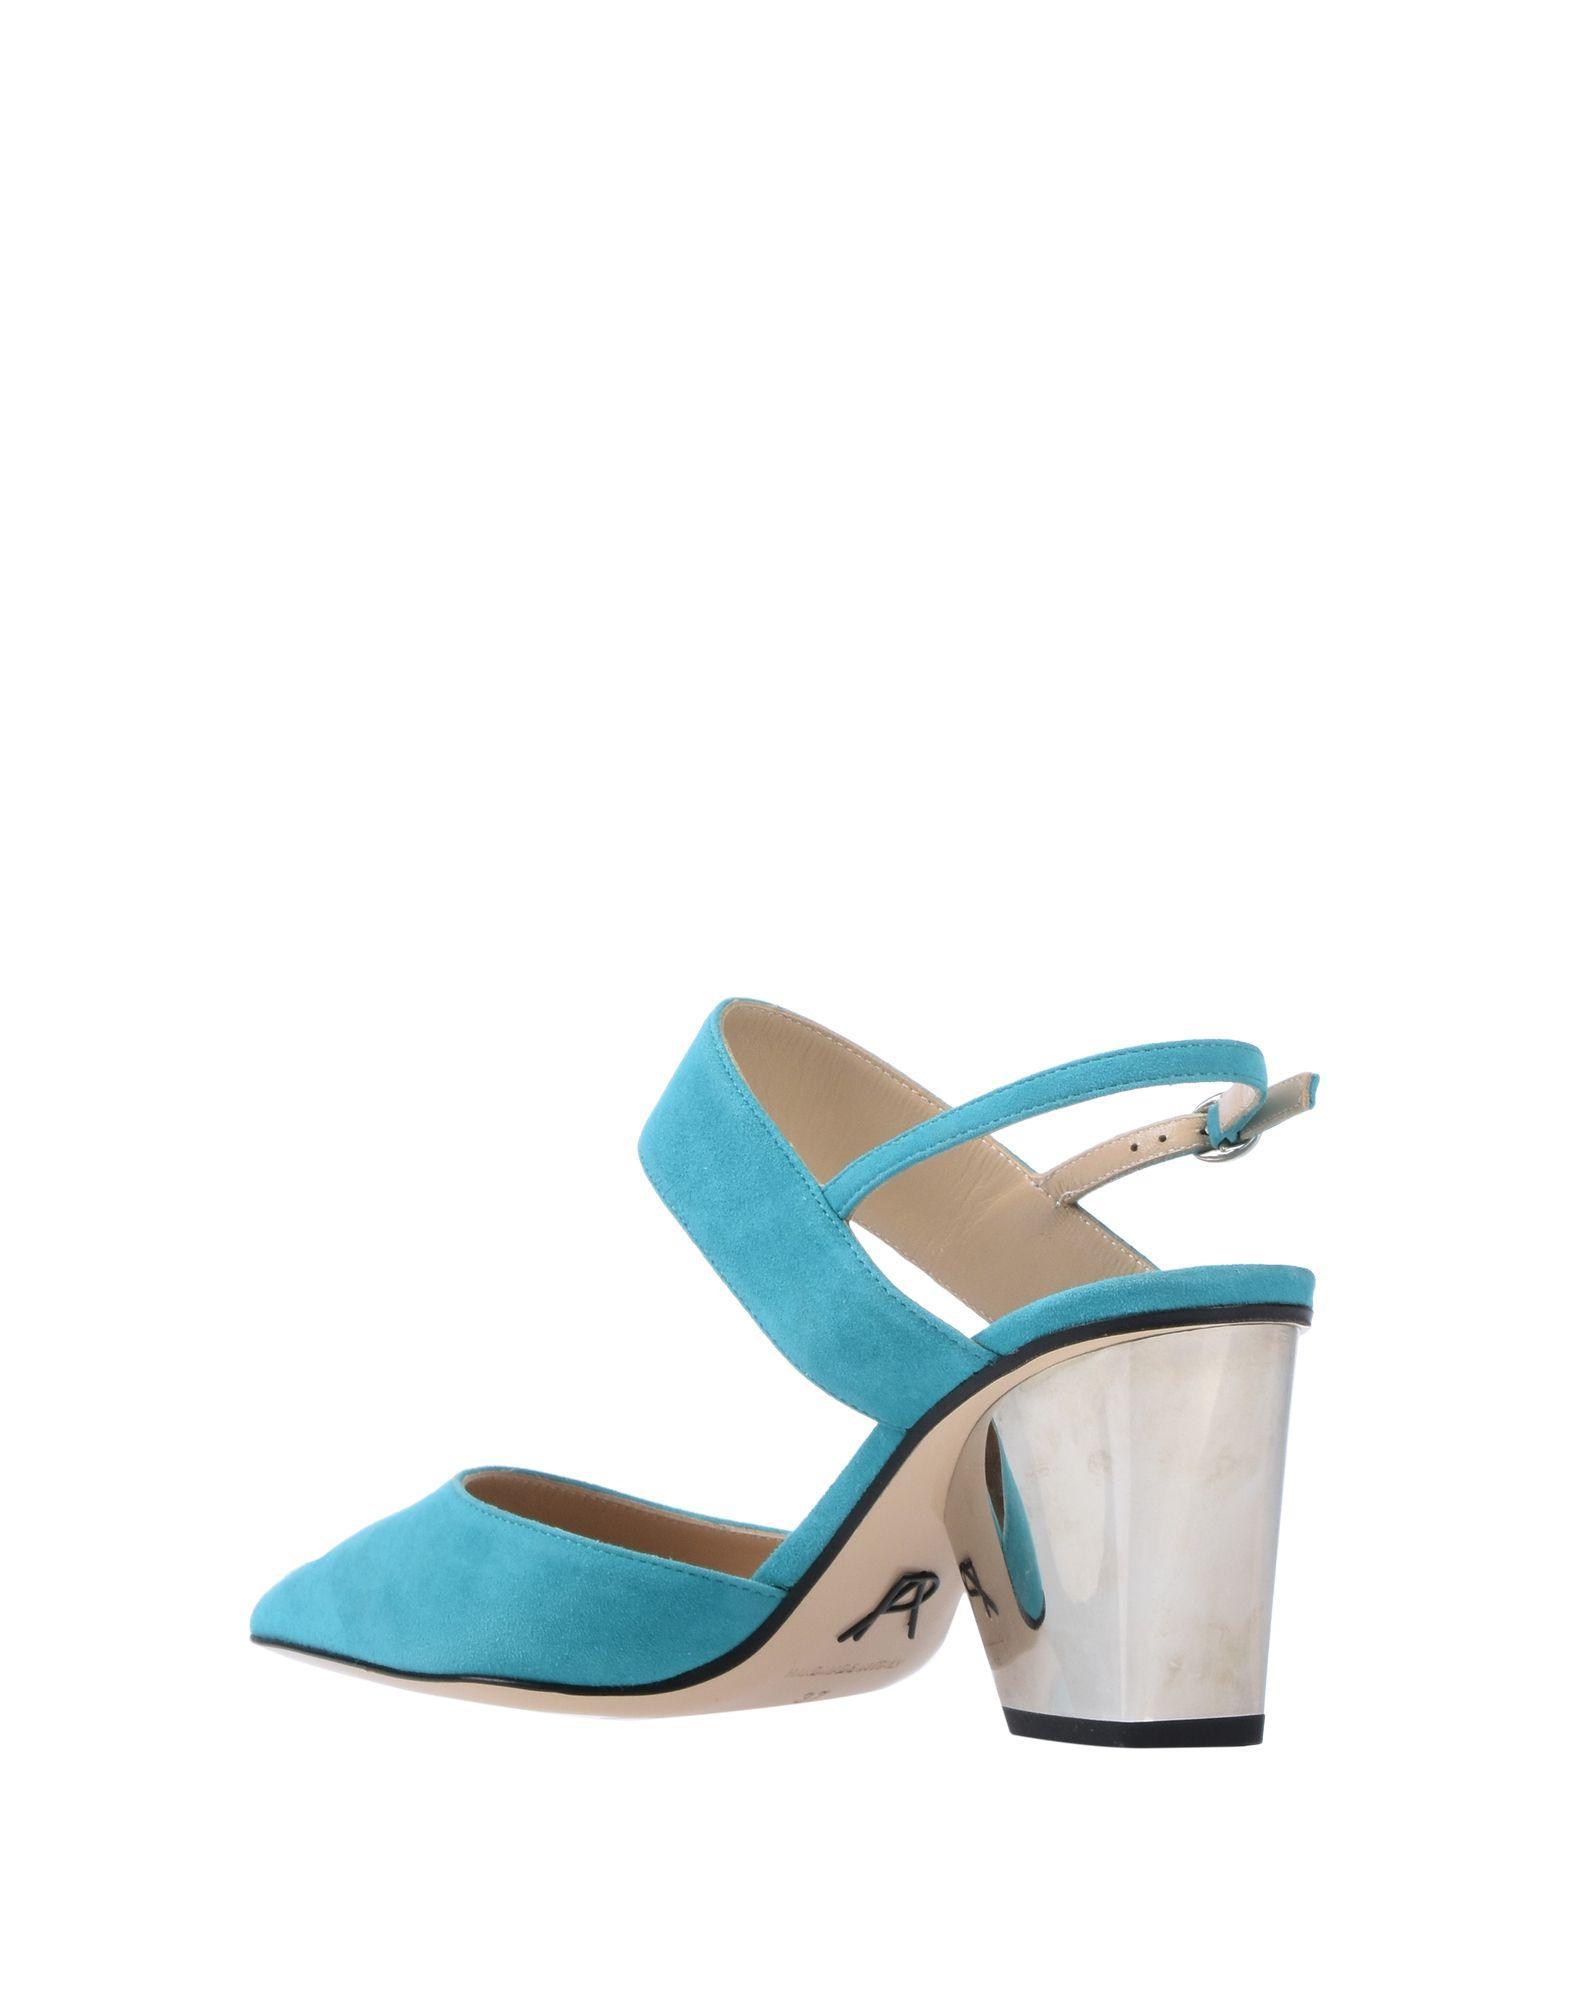 Zapatos de salón Paul Andrew de Ante de color Azul